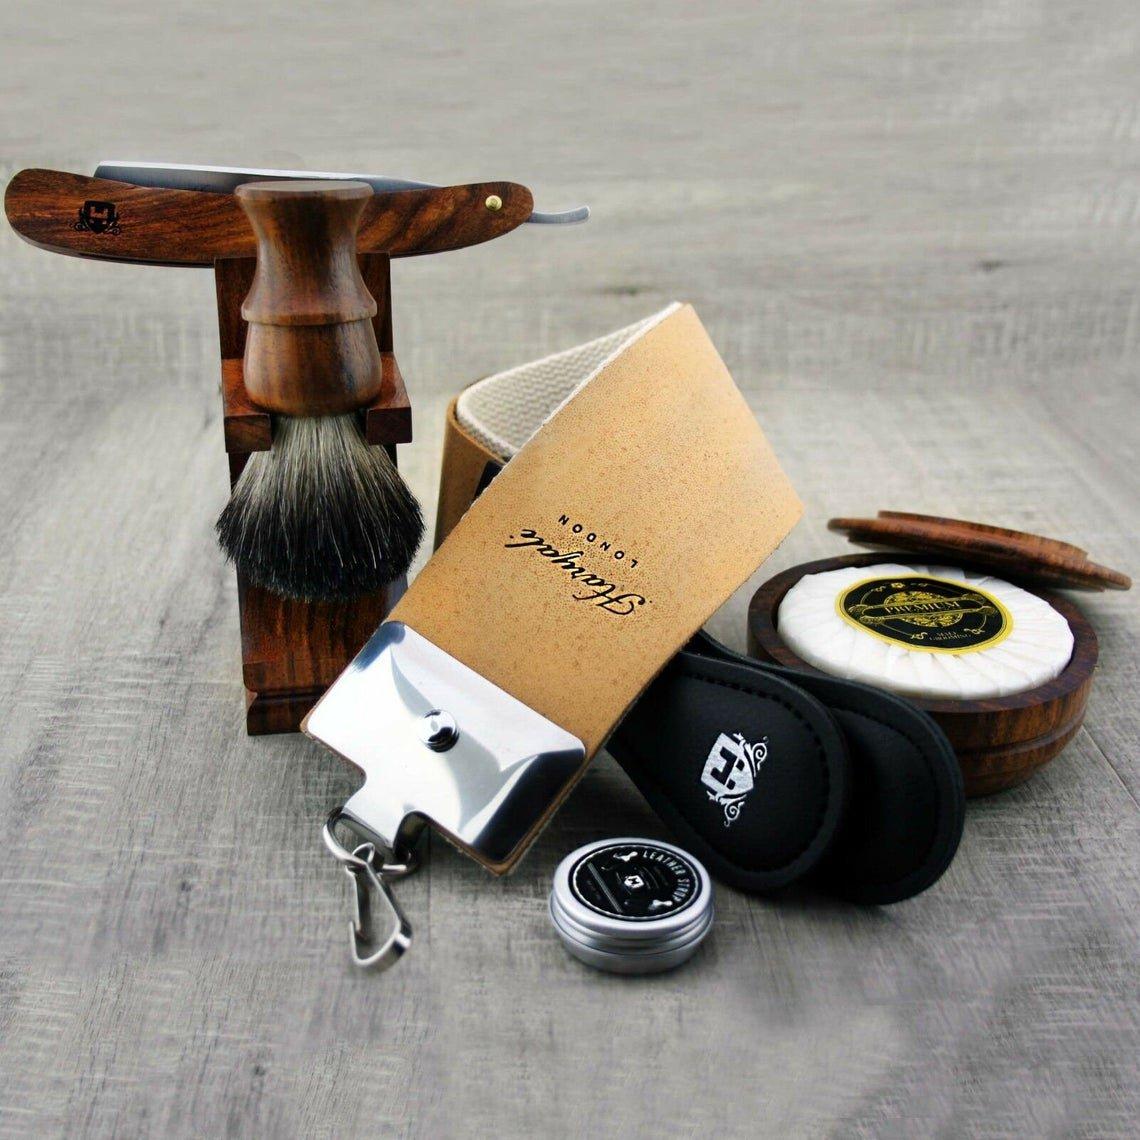 Vintage Wooden Barber Shaving Set Straight Cut Throat Razor Badger Brush Kit Bowl Soap Strop